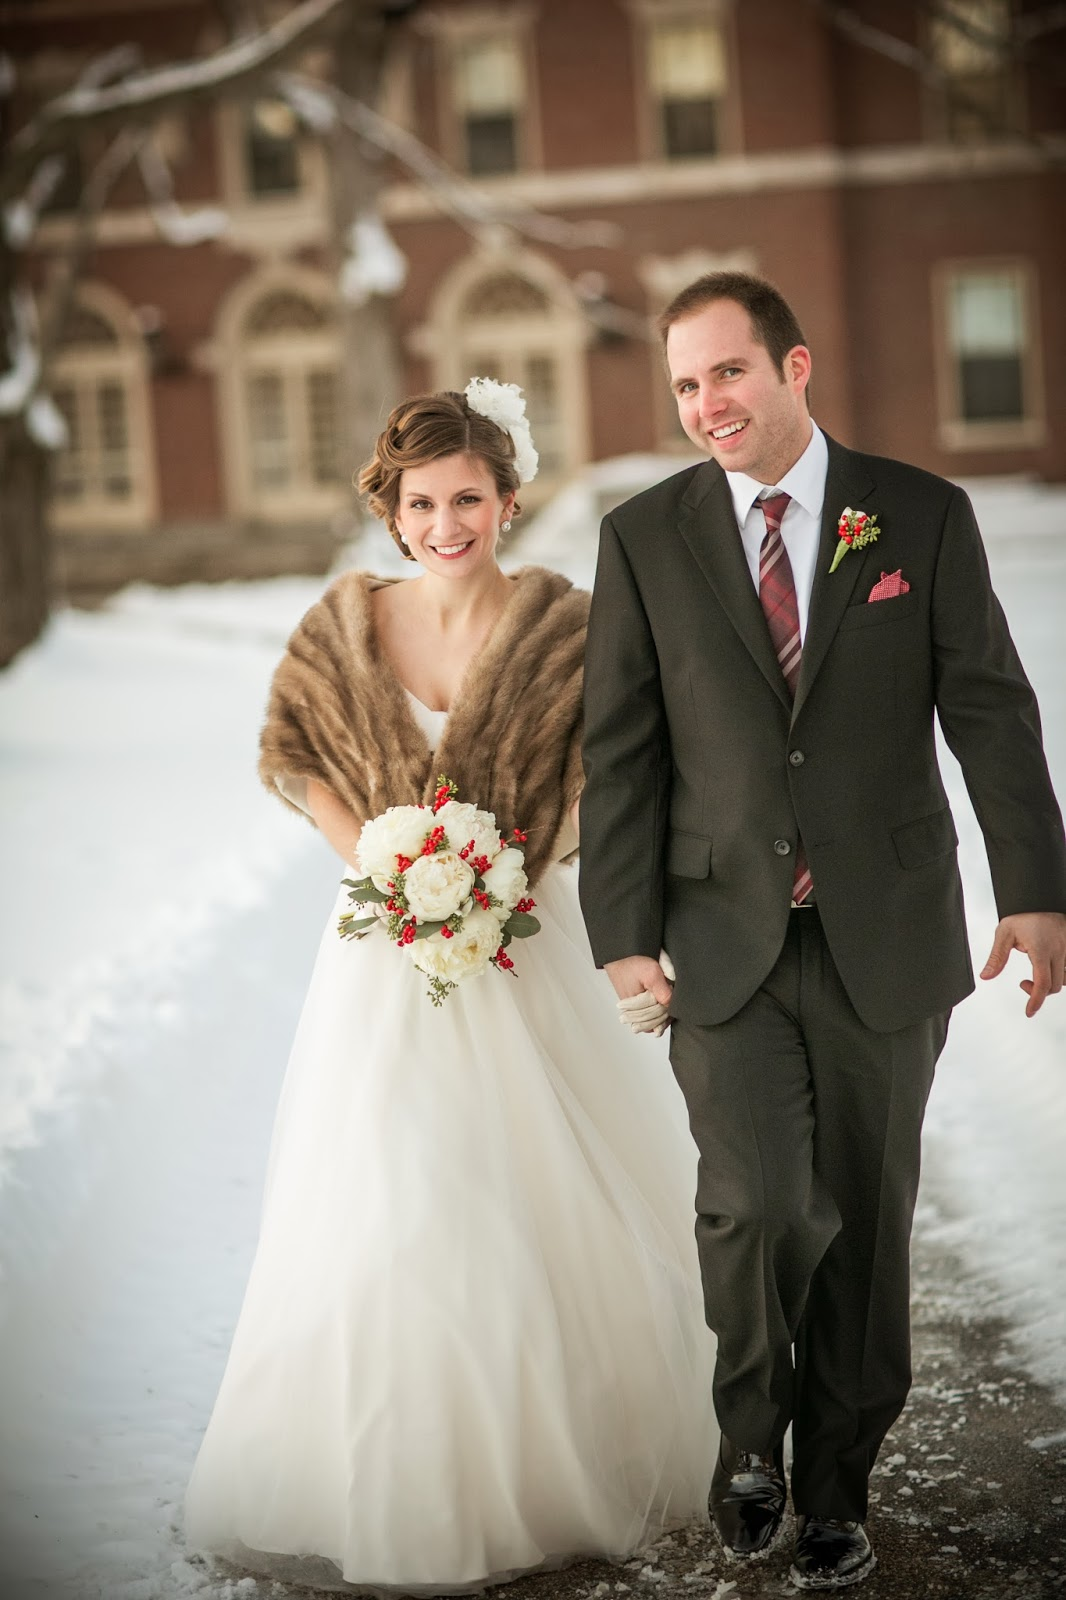 winter wedding : zev fisher photography : les fleurs : winter wedding in new england : mink shrug : white peonies, red ilex berries & seeded eucalyptus